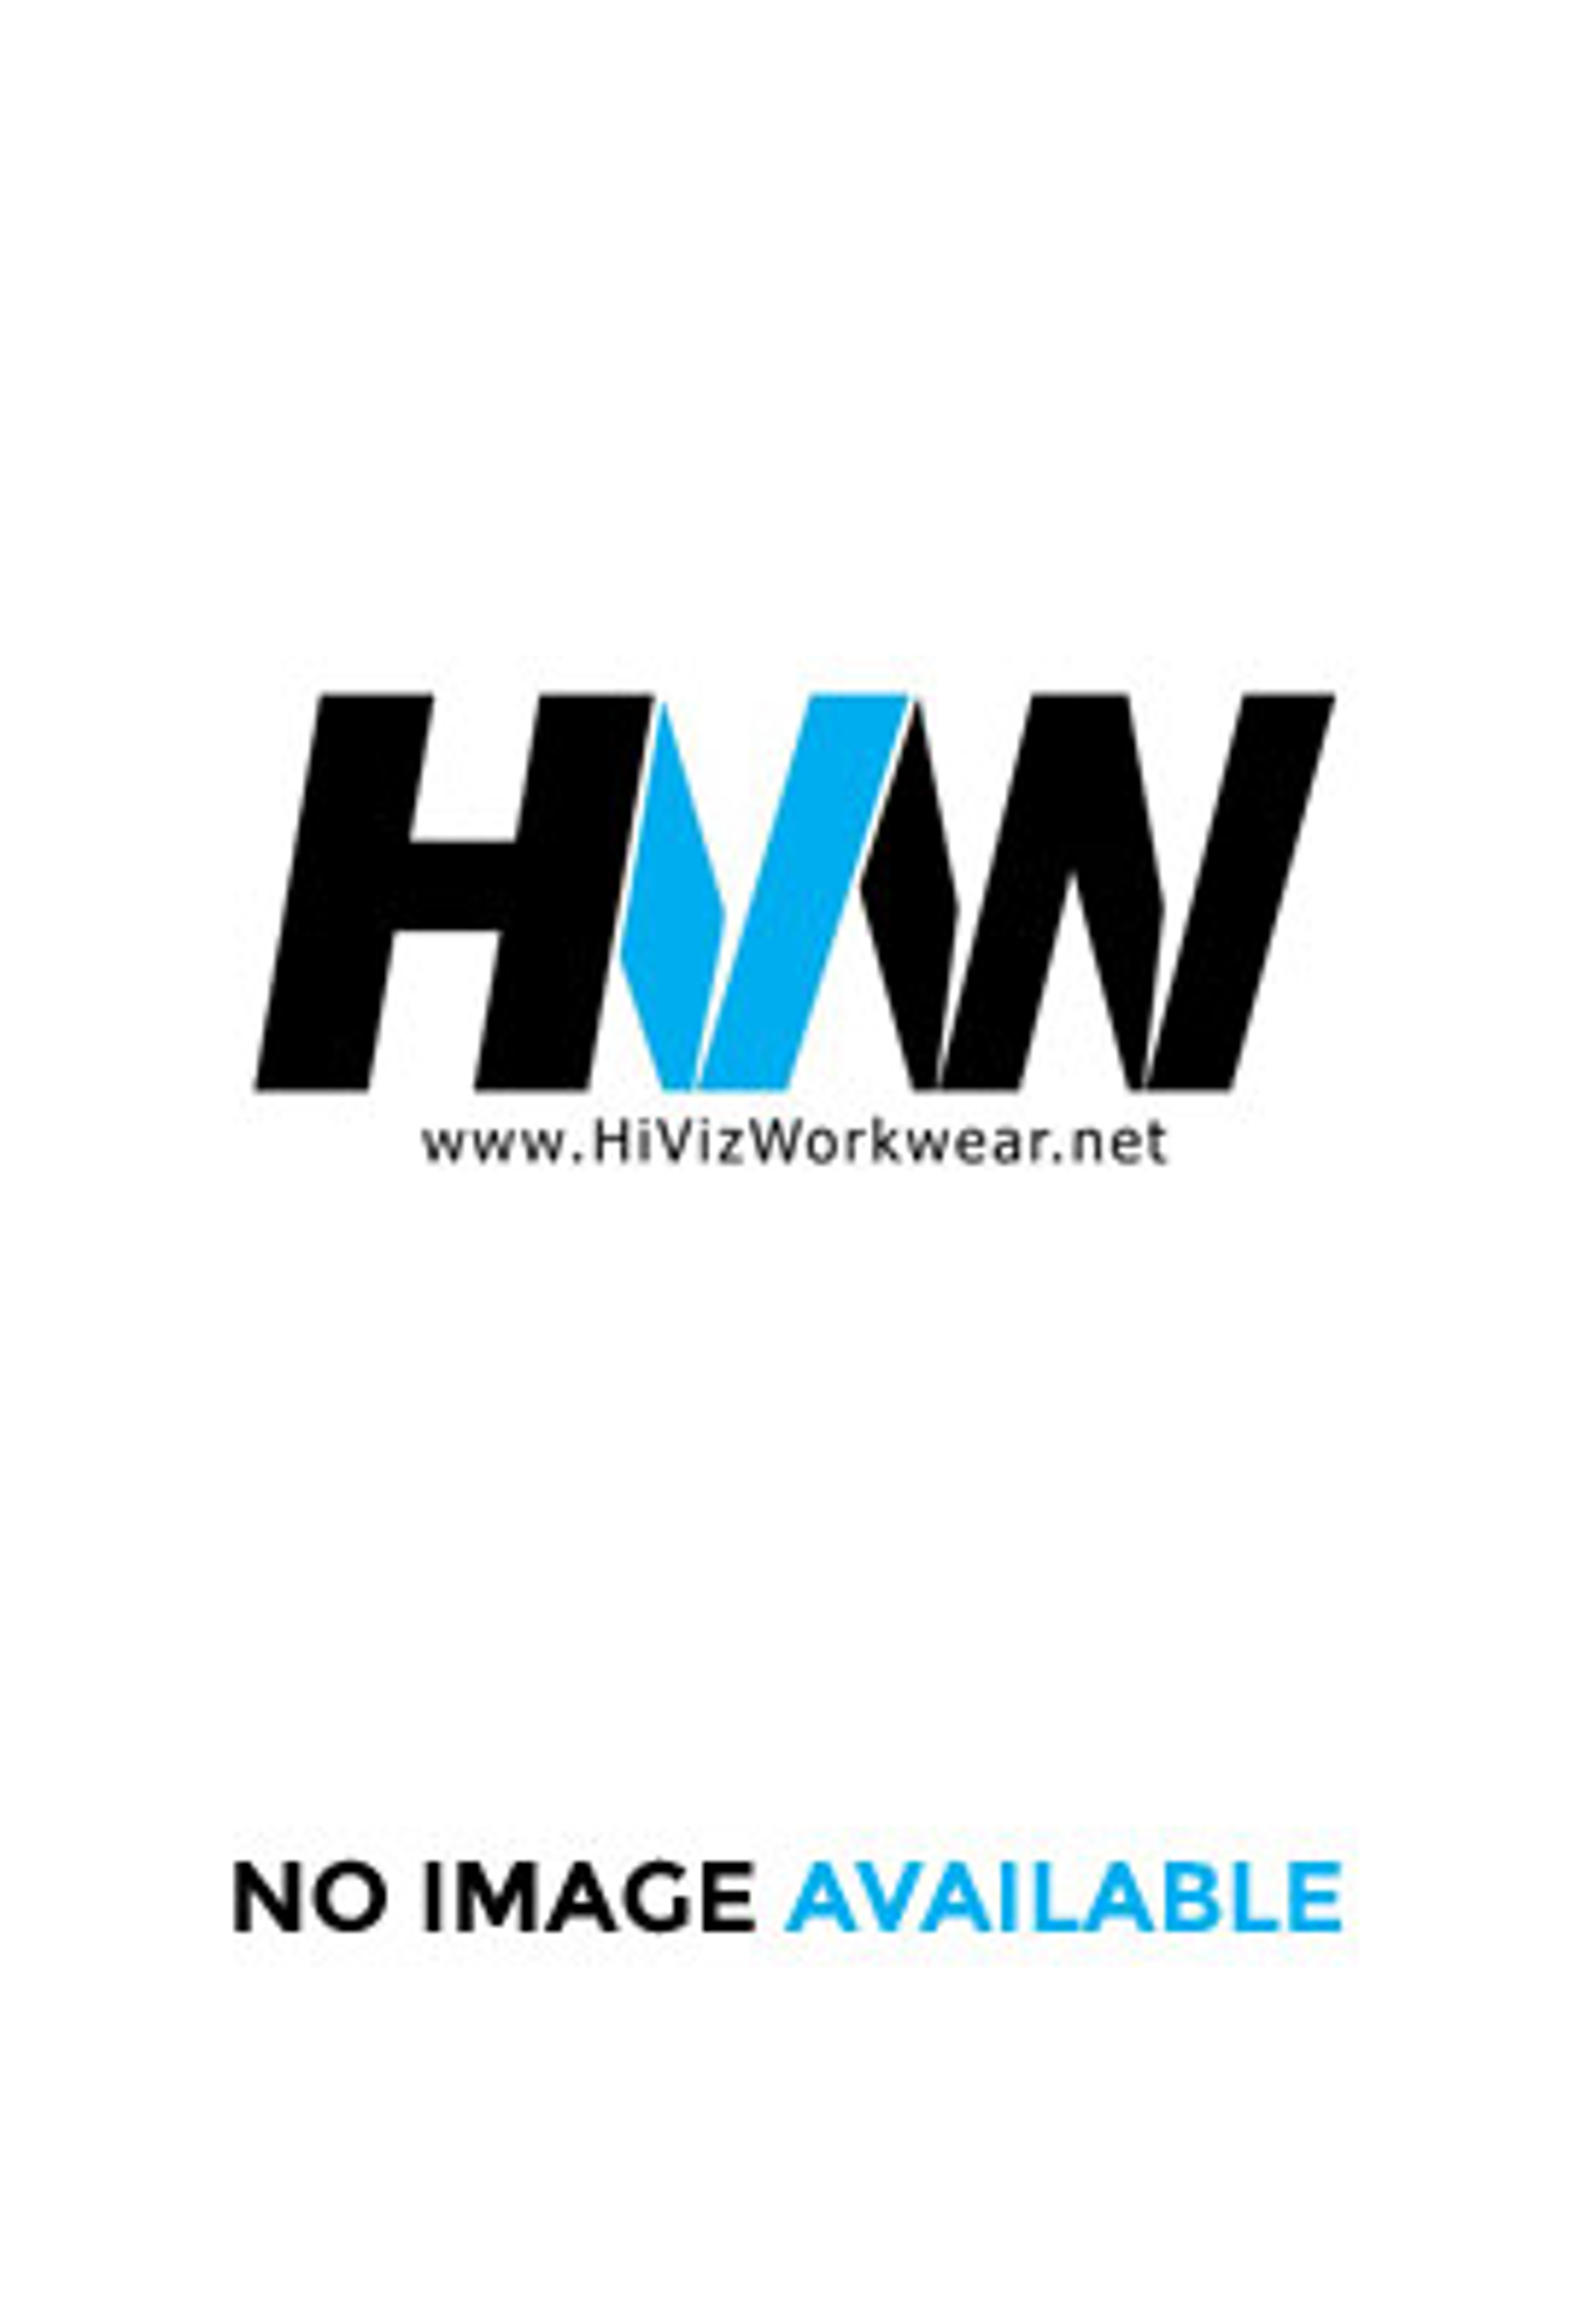 PR207 Supreme Poplin Long Sleeved Shirt  (Collar size 14.5 To 19.0)